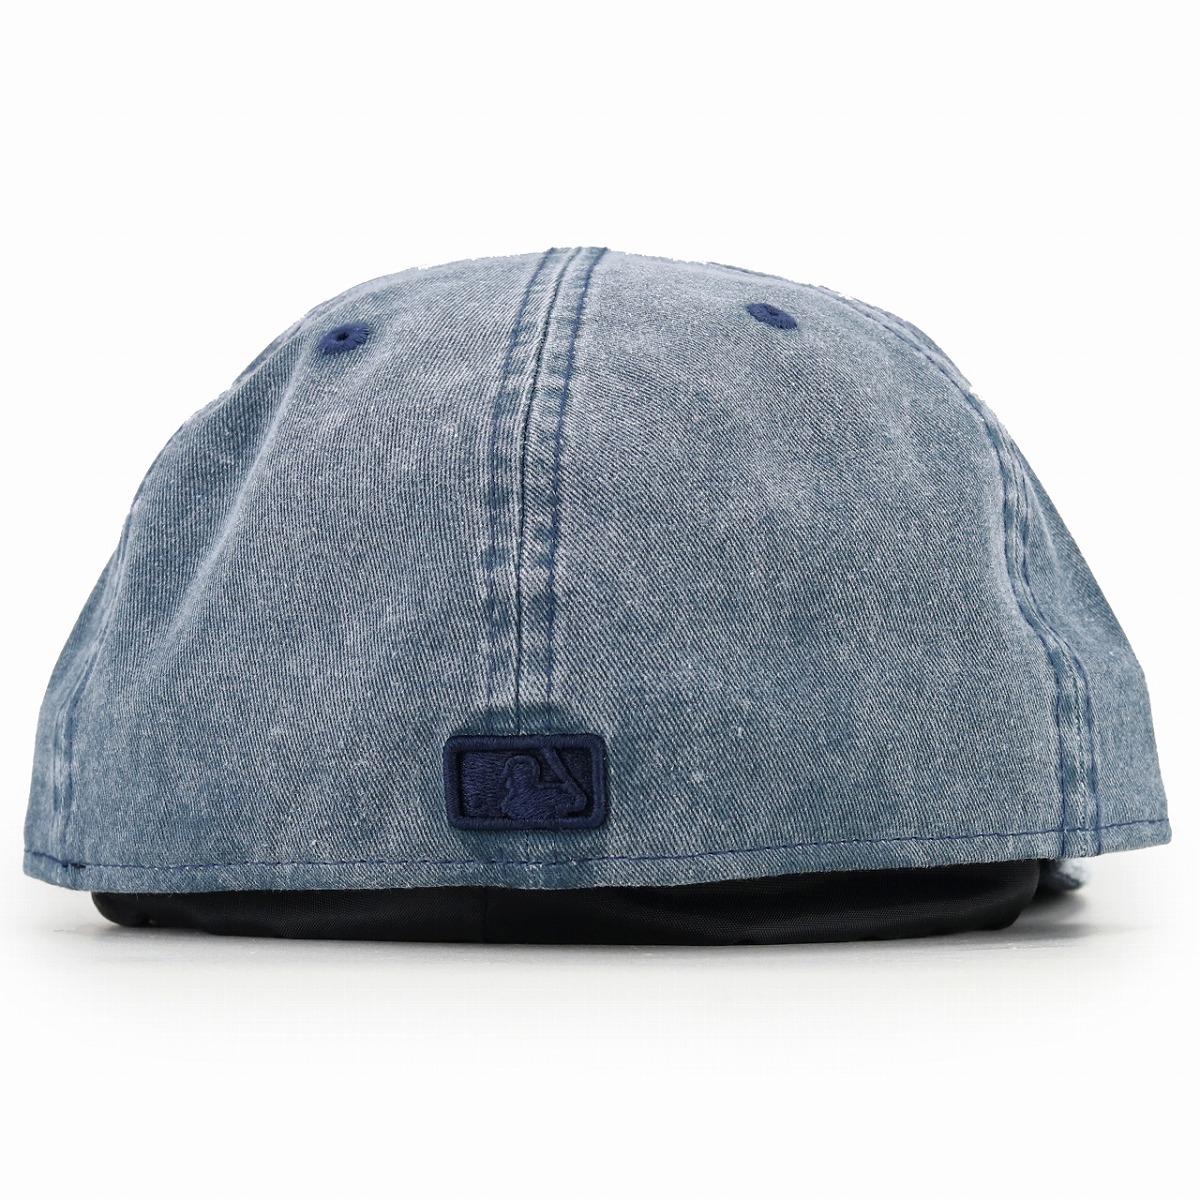 Mens NY New York Yankees Flat Peak Ribbed Knit Beanie Cap Hat